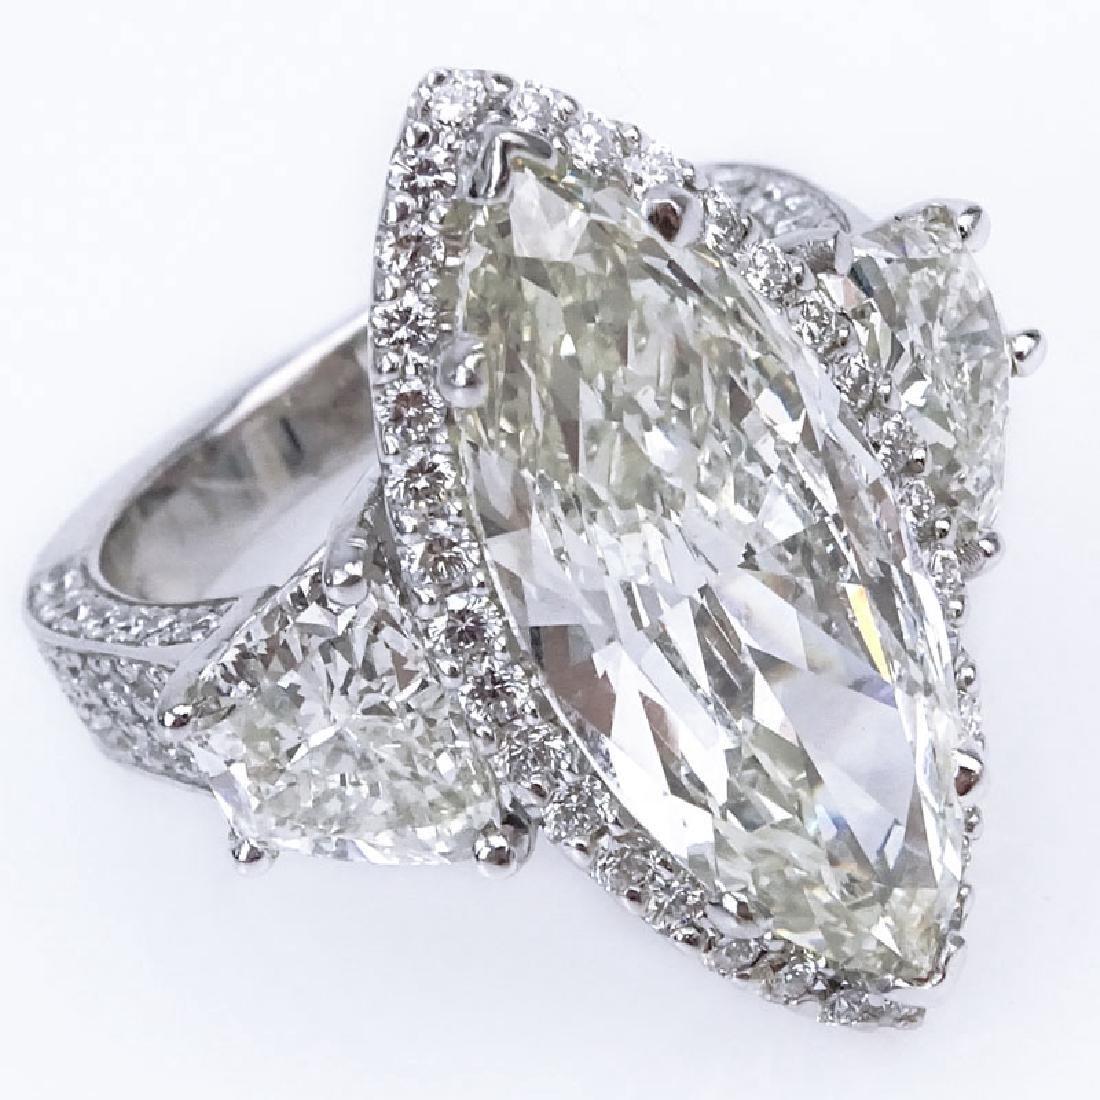 Approx. 10.64 Carat TW Diamond and 14 Karat White Gold